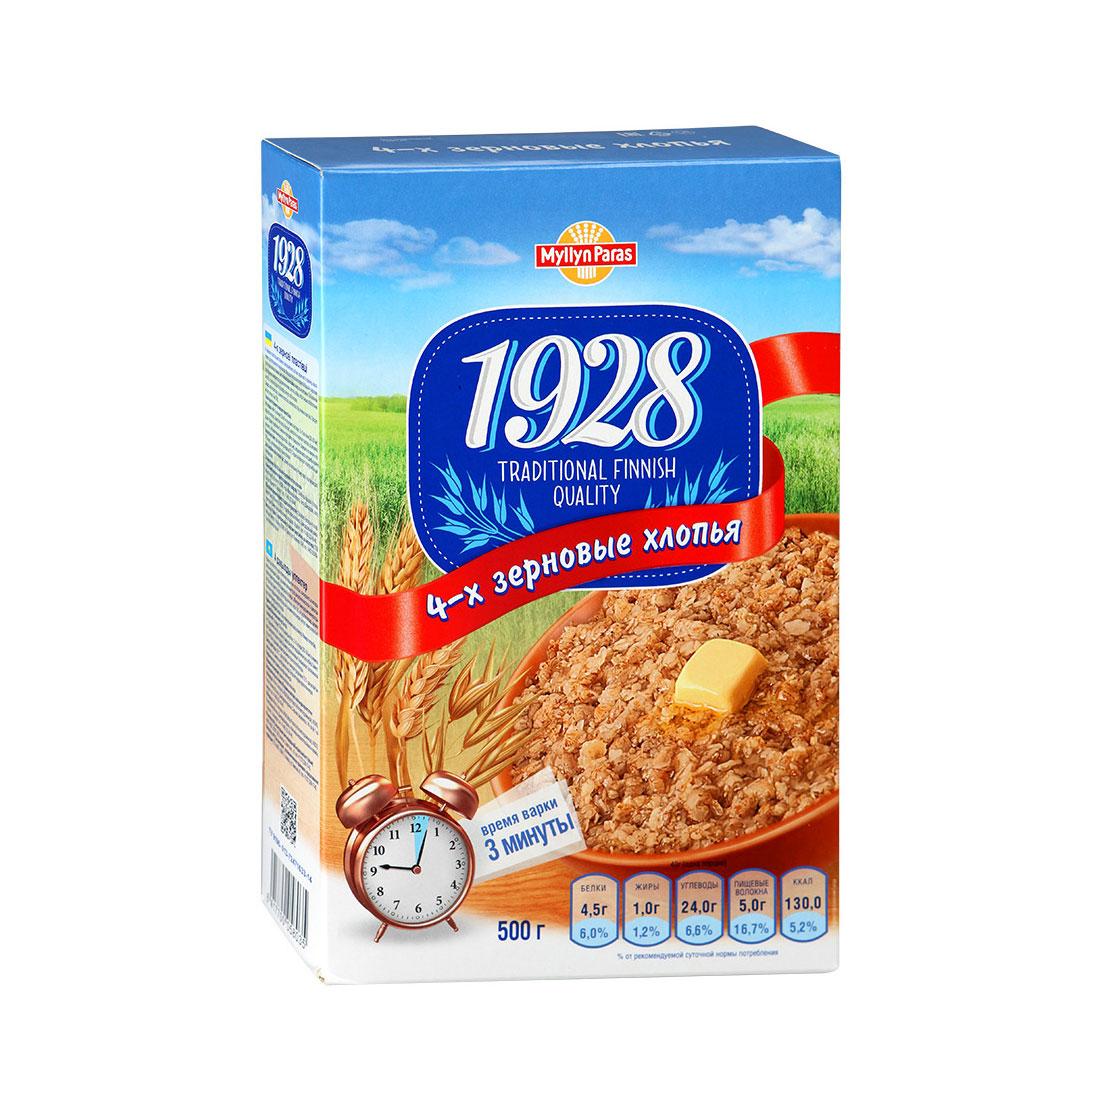 Хлопья Myllyn Paras 4 зерновые (с 12 мес) 500 гр<br>